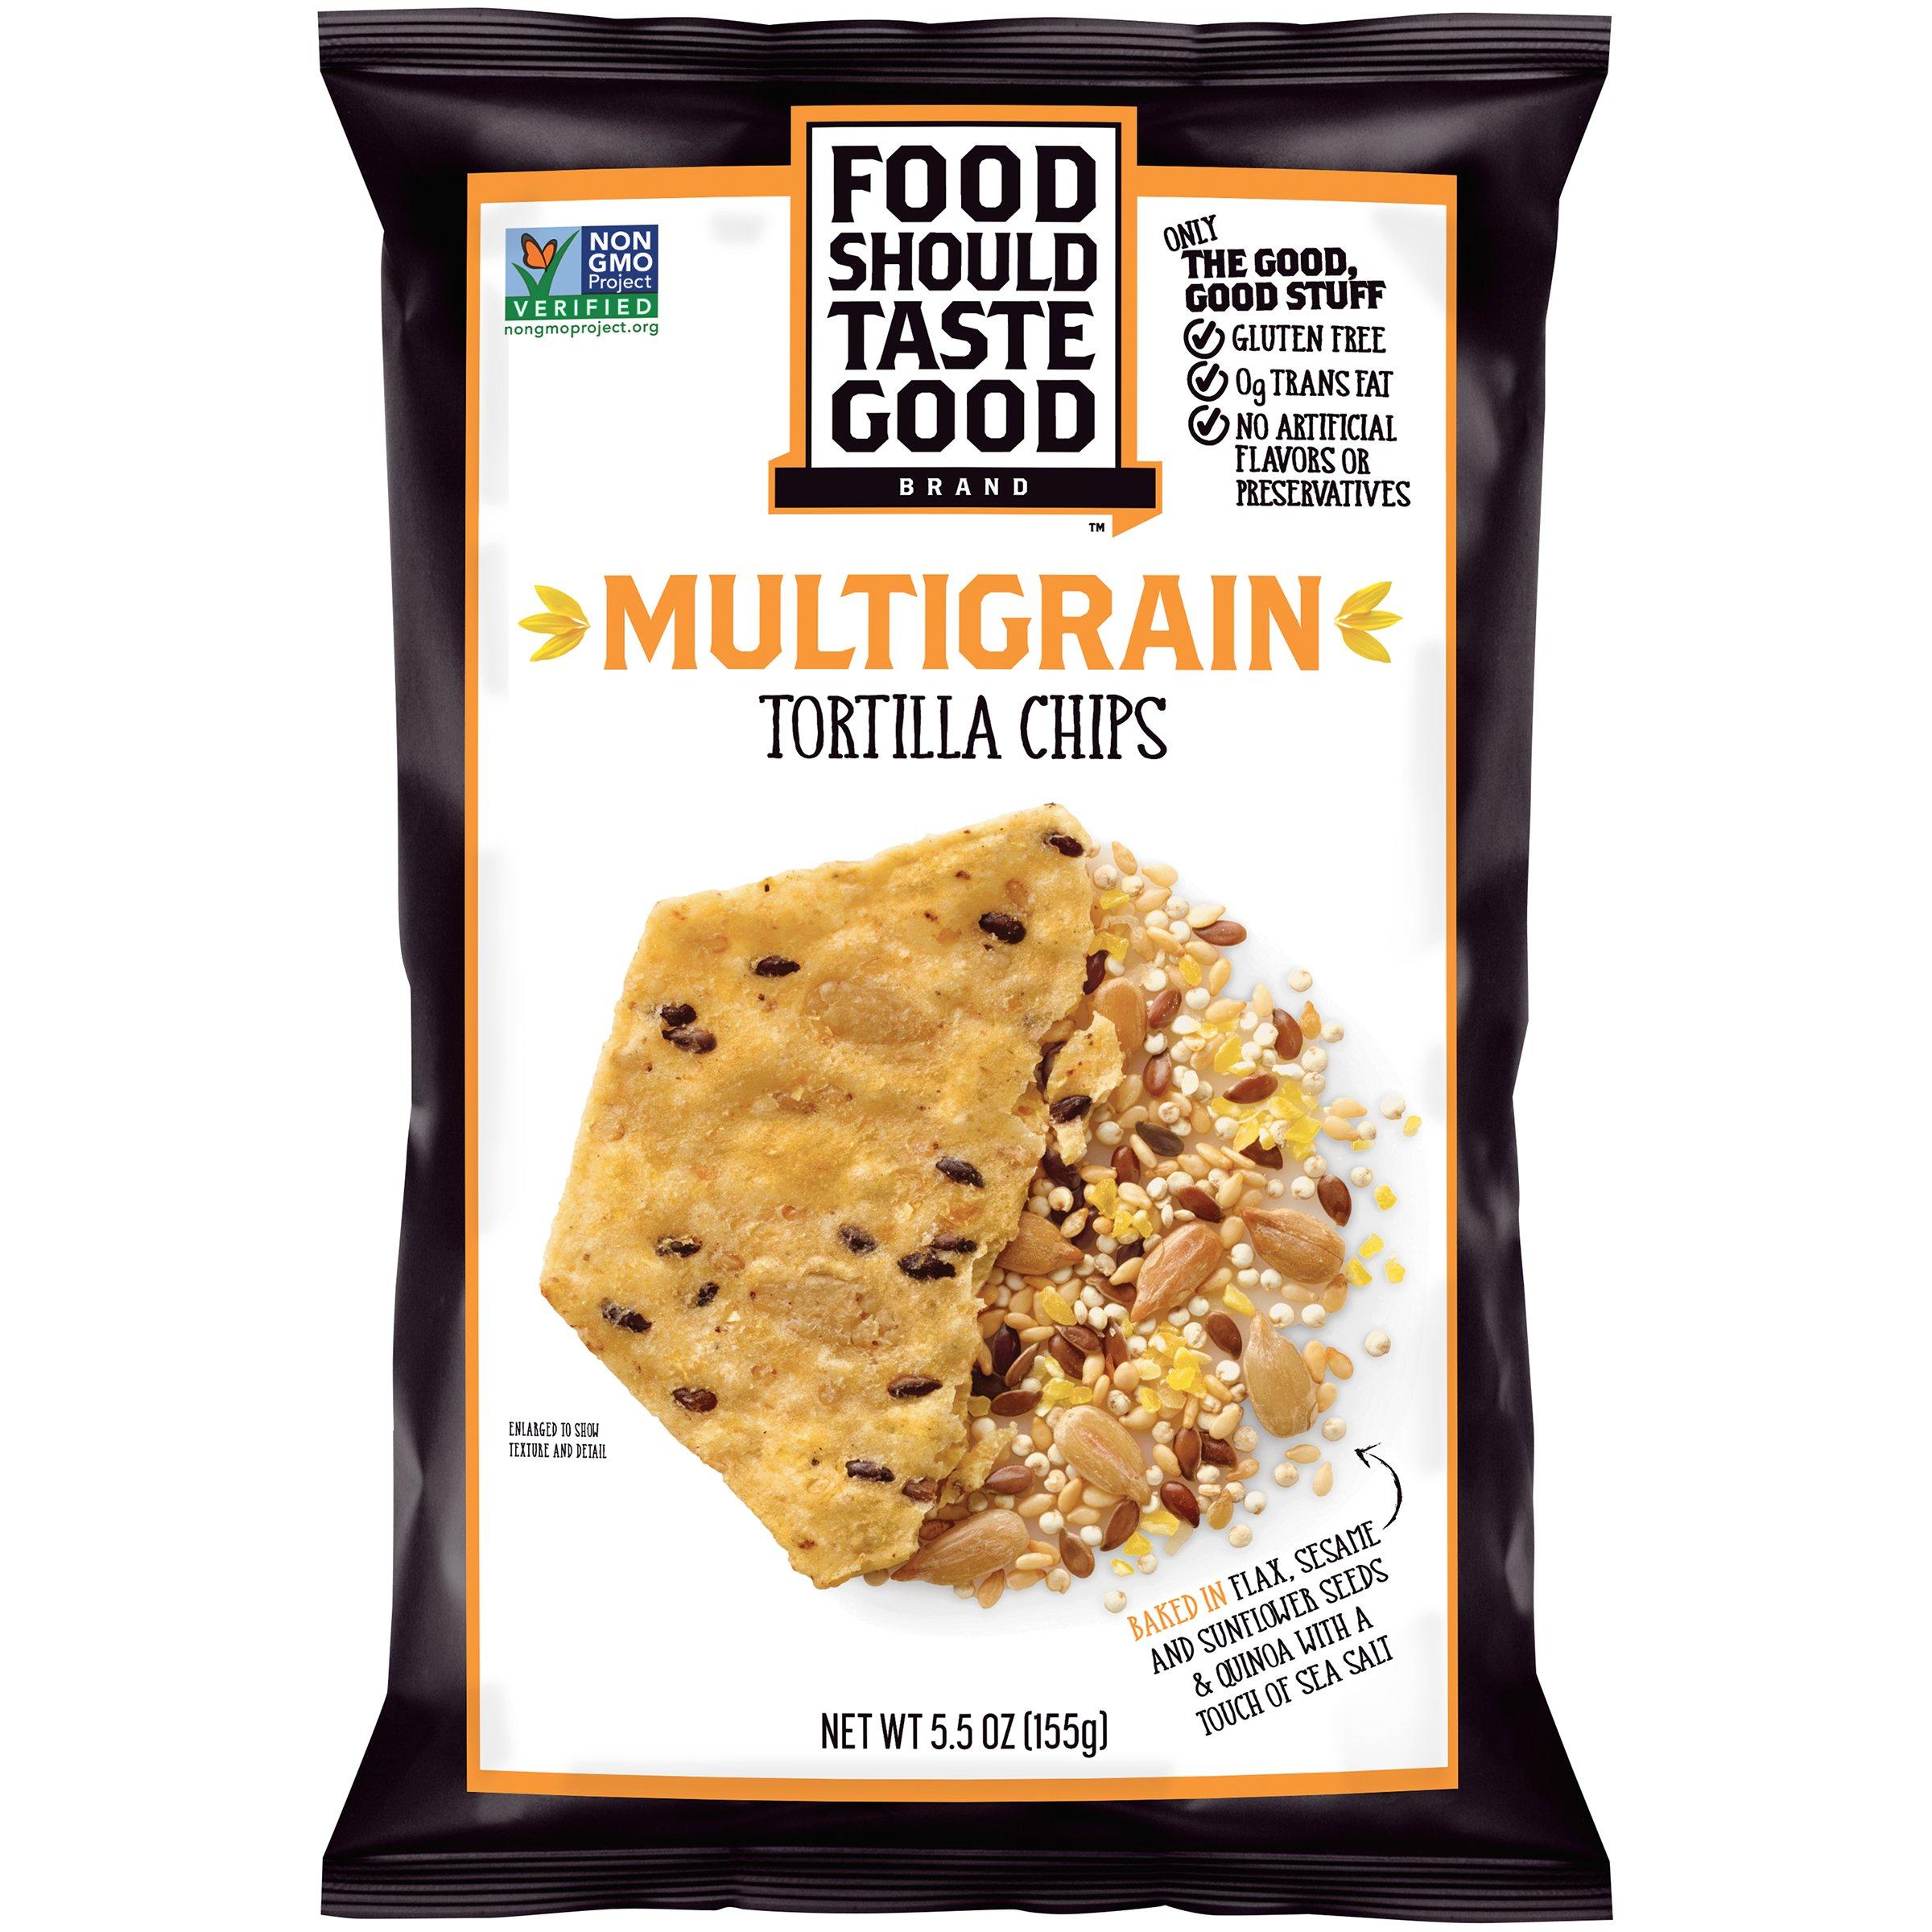 Food Should Taste Good, Tortilla Chips, Multigrain, Gluten Free Chips, 5.5 oz (Pack of 12) by Food Should Taste Good